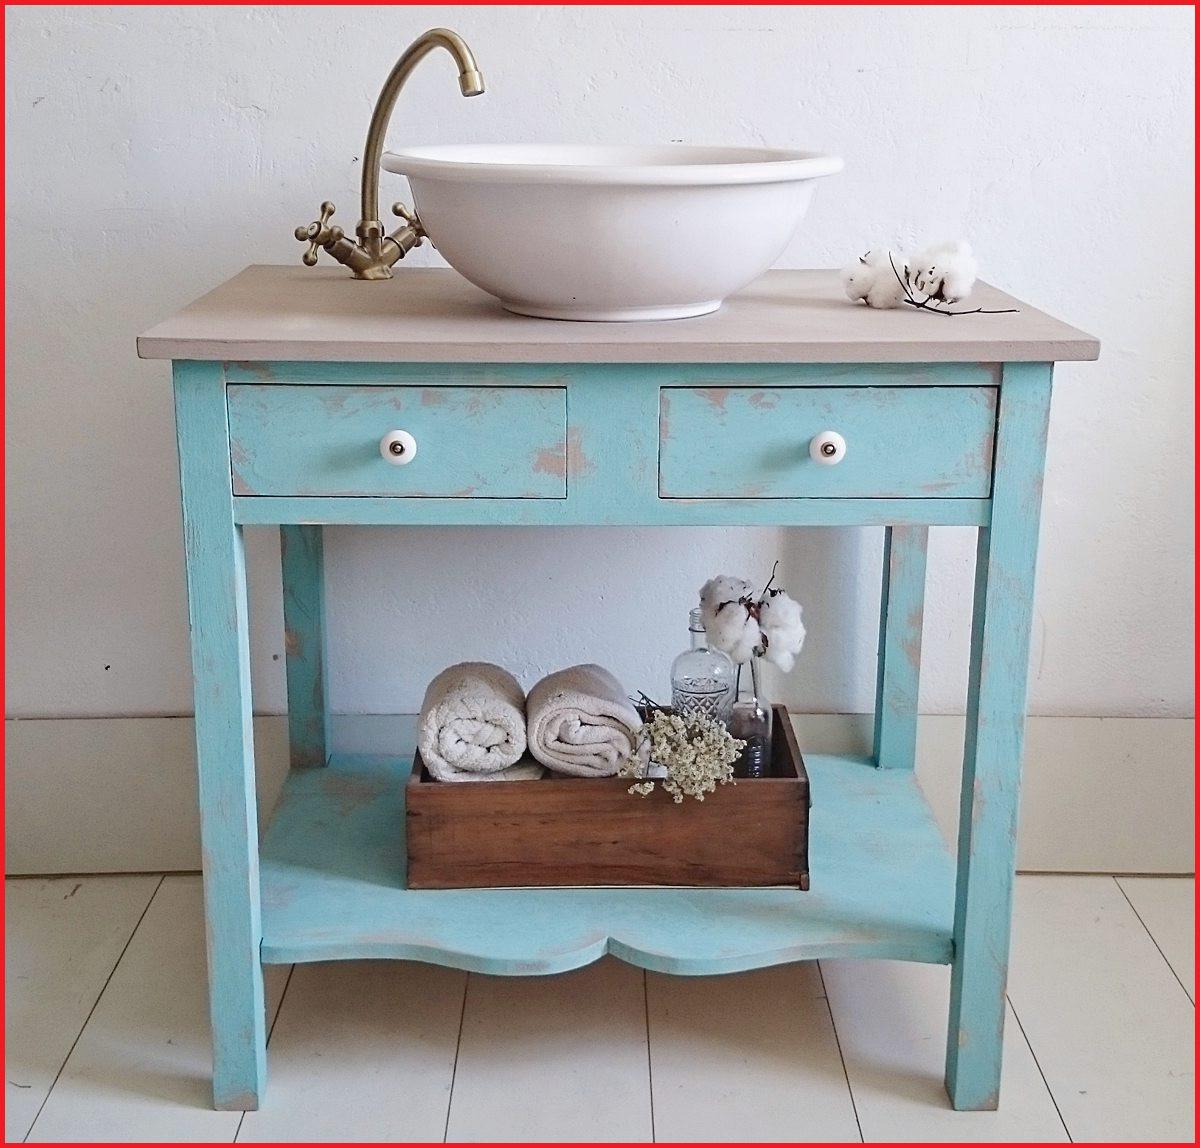 Mueble Baño Azul E6d5 Imagenes De Muebles De Baà O Muebles De Bano Azul Turquesa